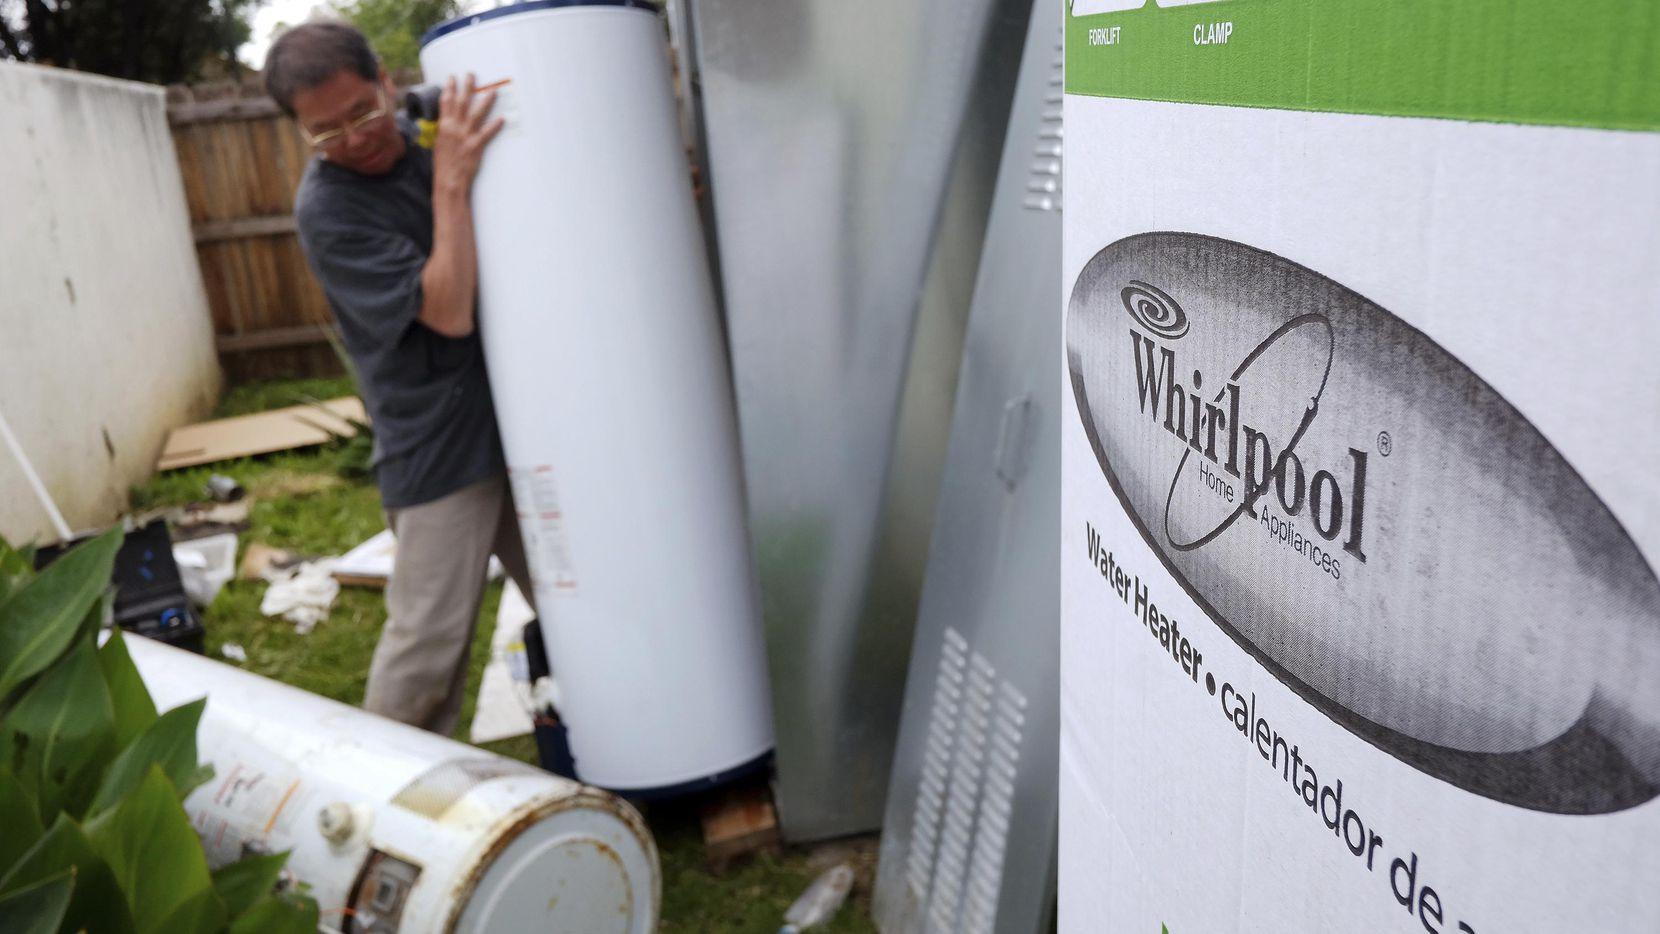 Un tanque para calenar agua de la marca Whirlpool.(AP)